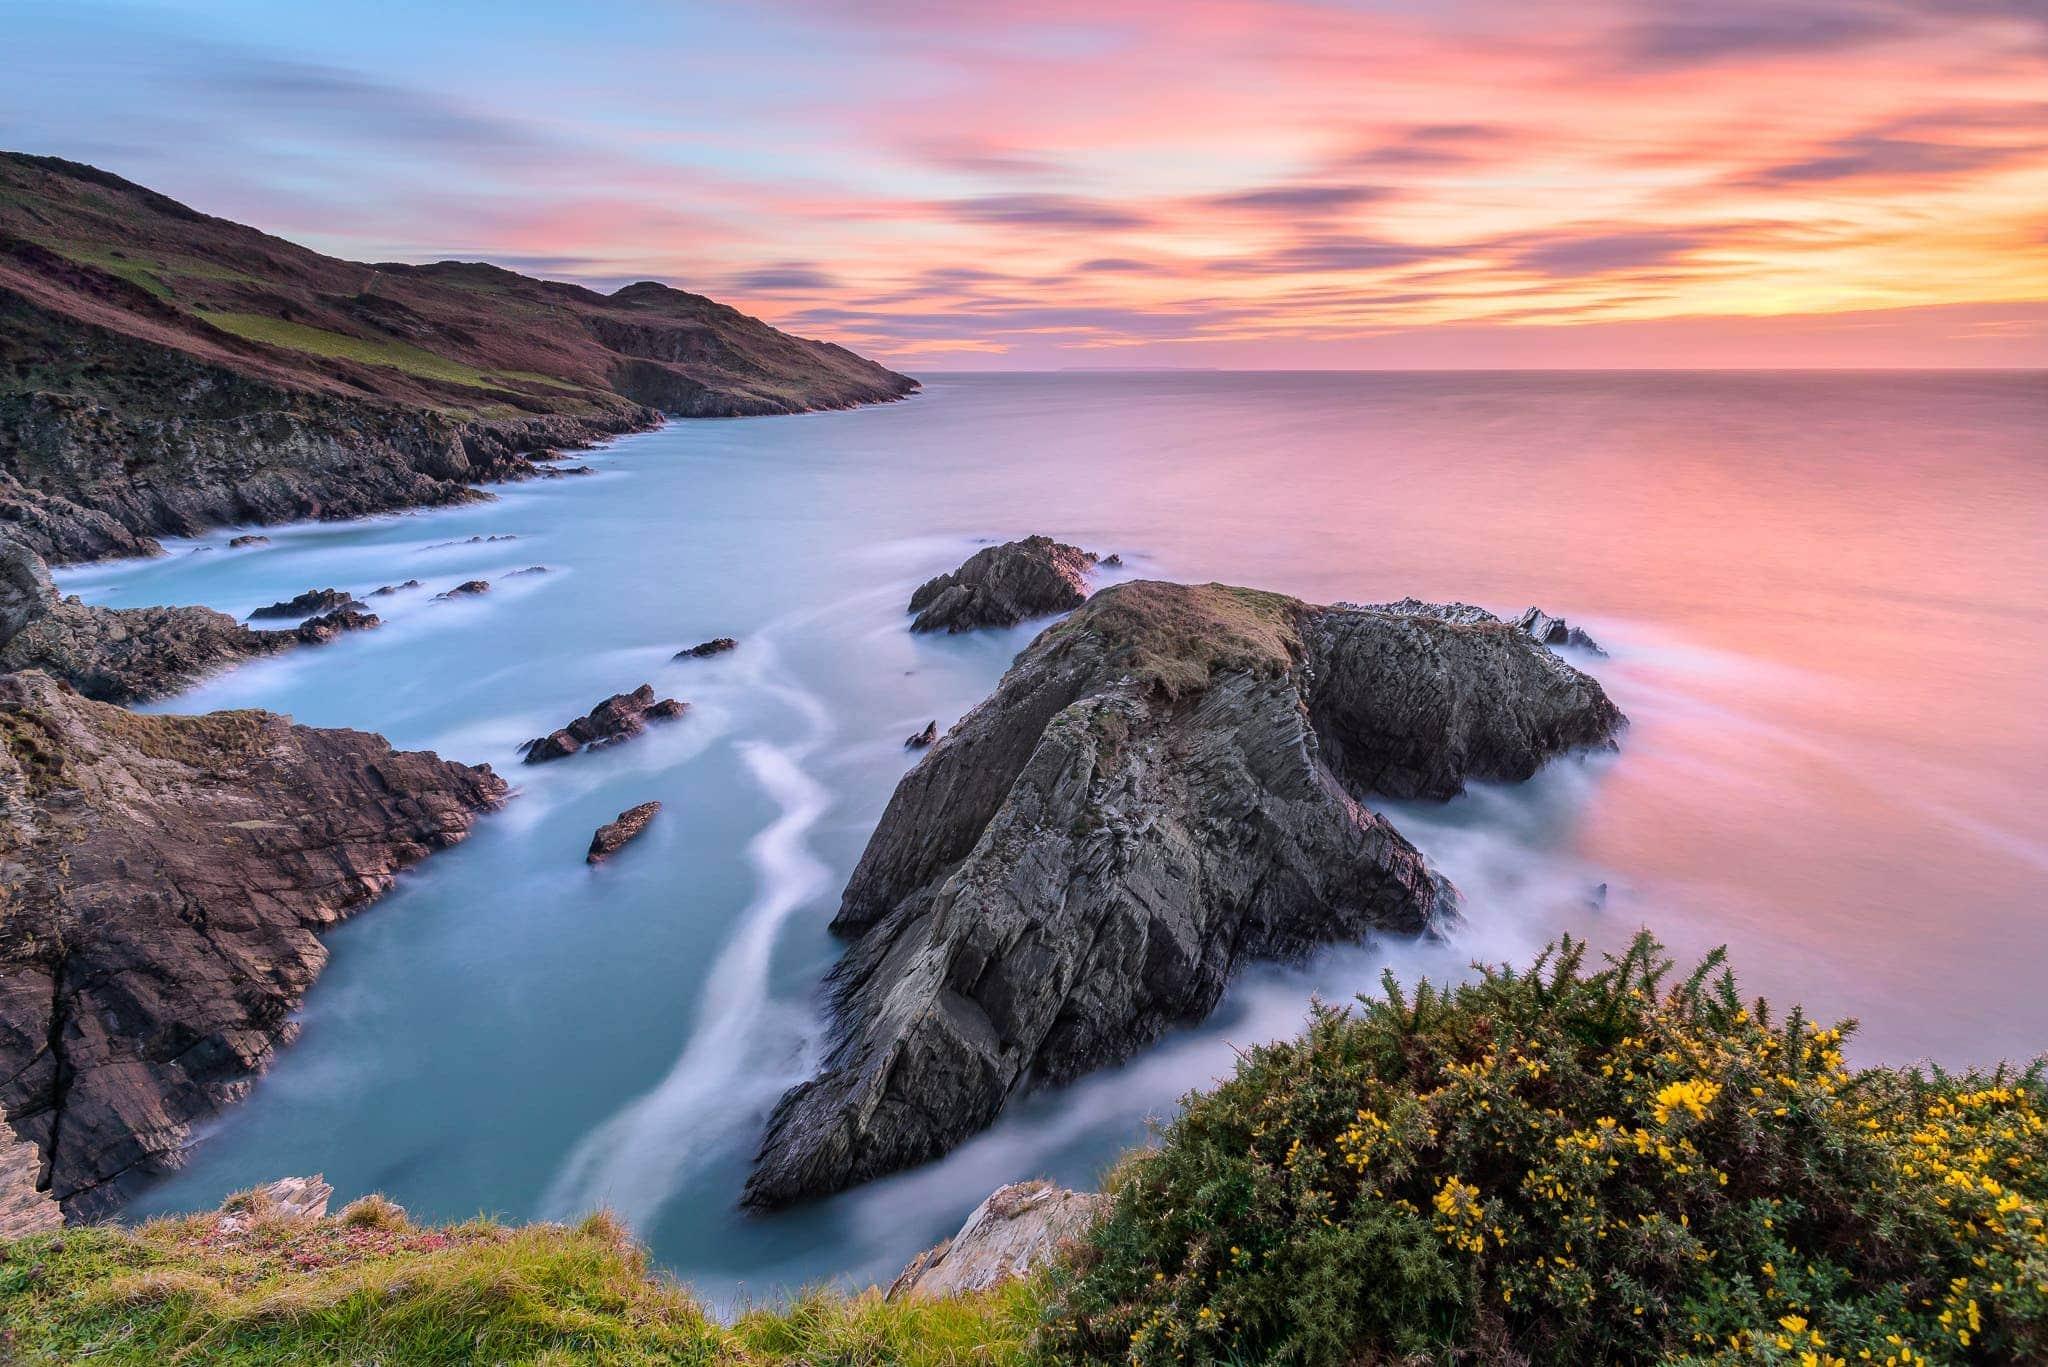 Francesco Gola Seascape Landscape Photography Uk Devon Cornwall Long Exposure